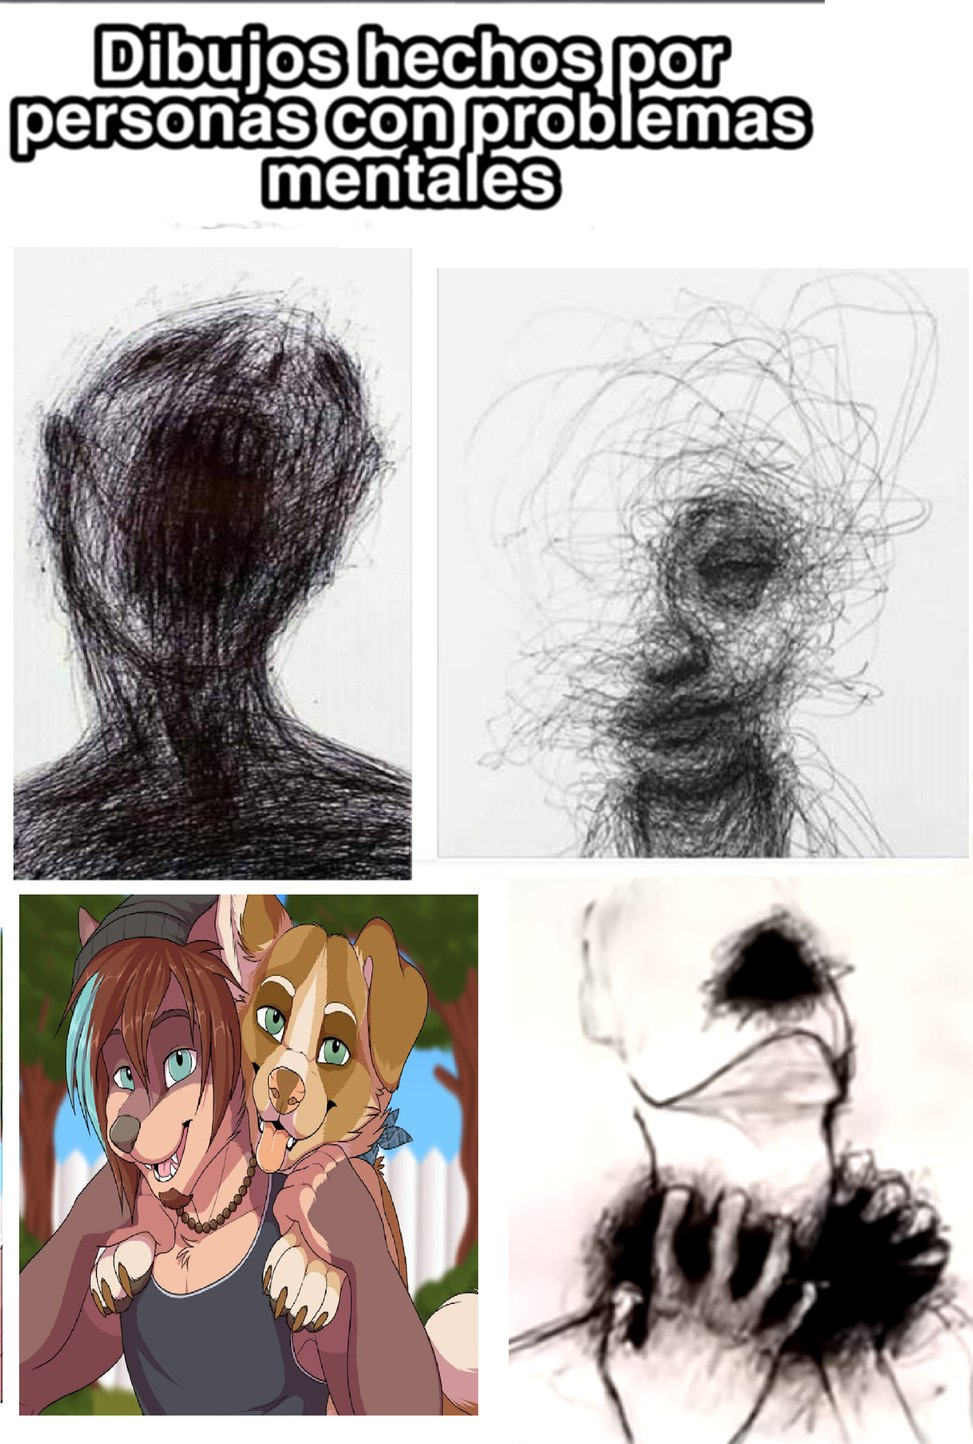 Dibujos hechos por personas mentalmente trastornadas - meme